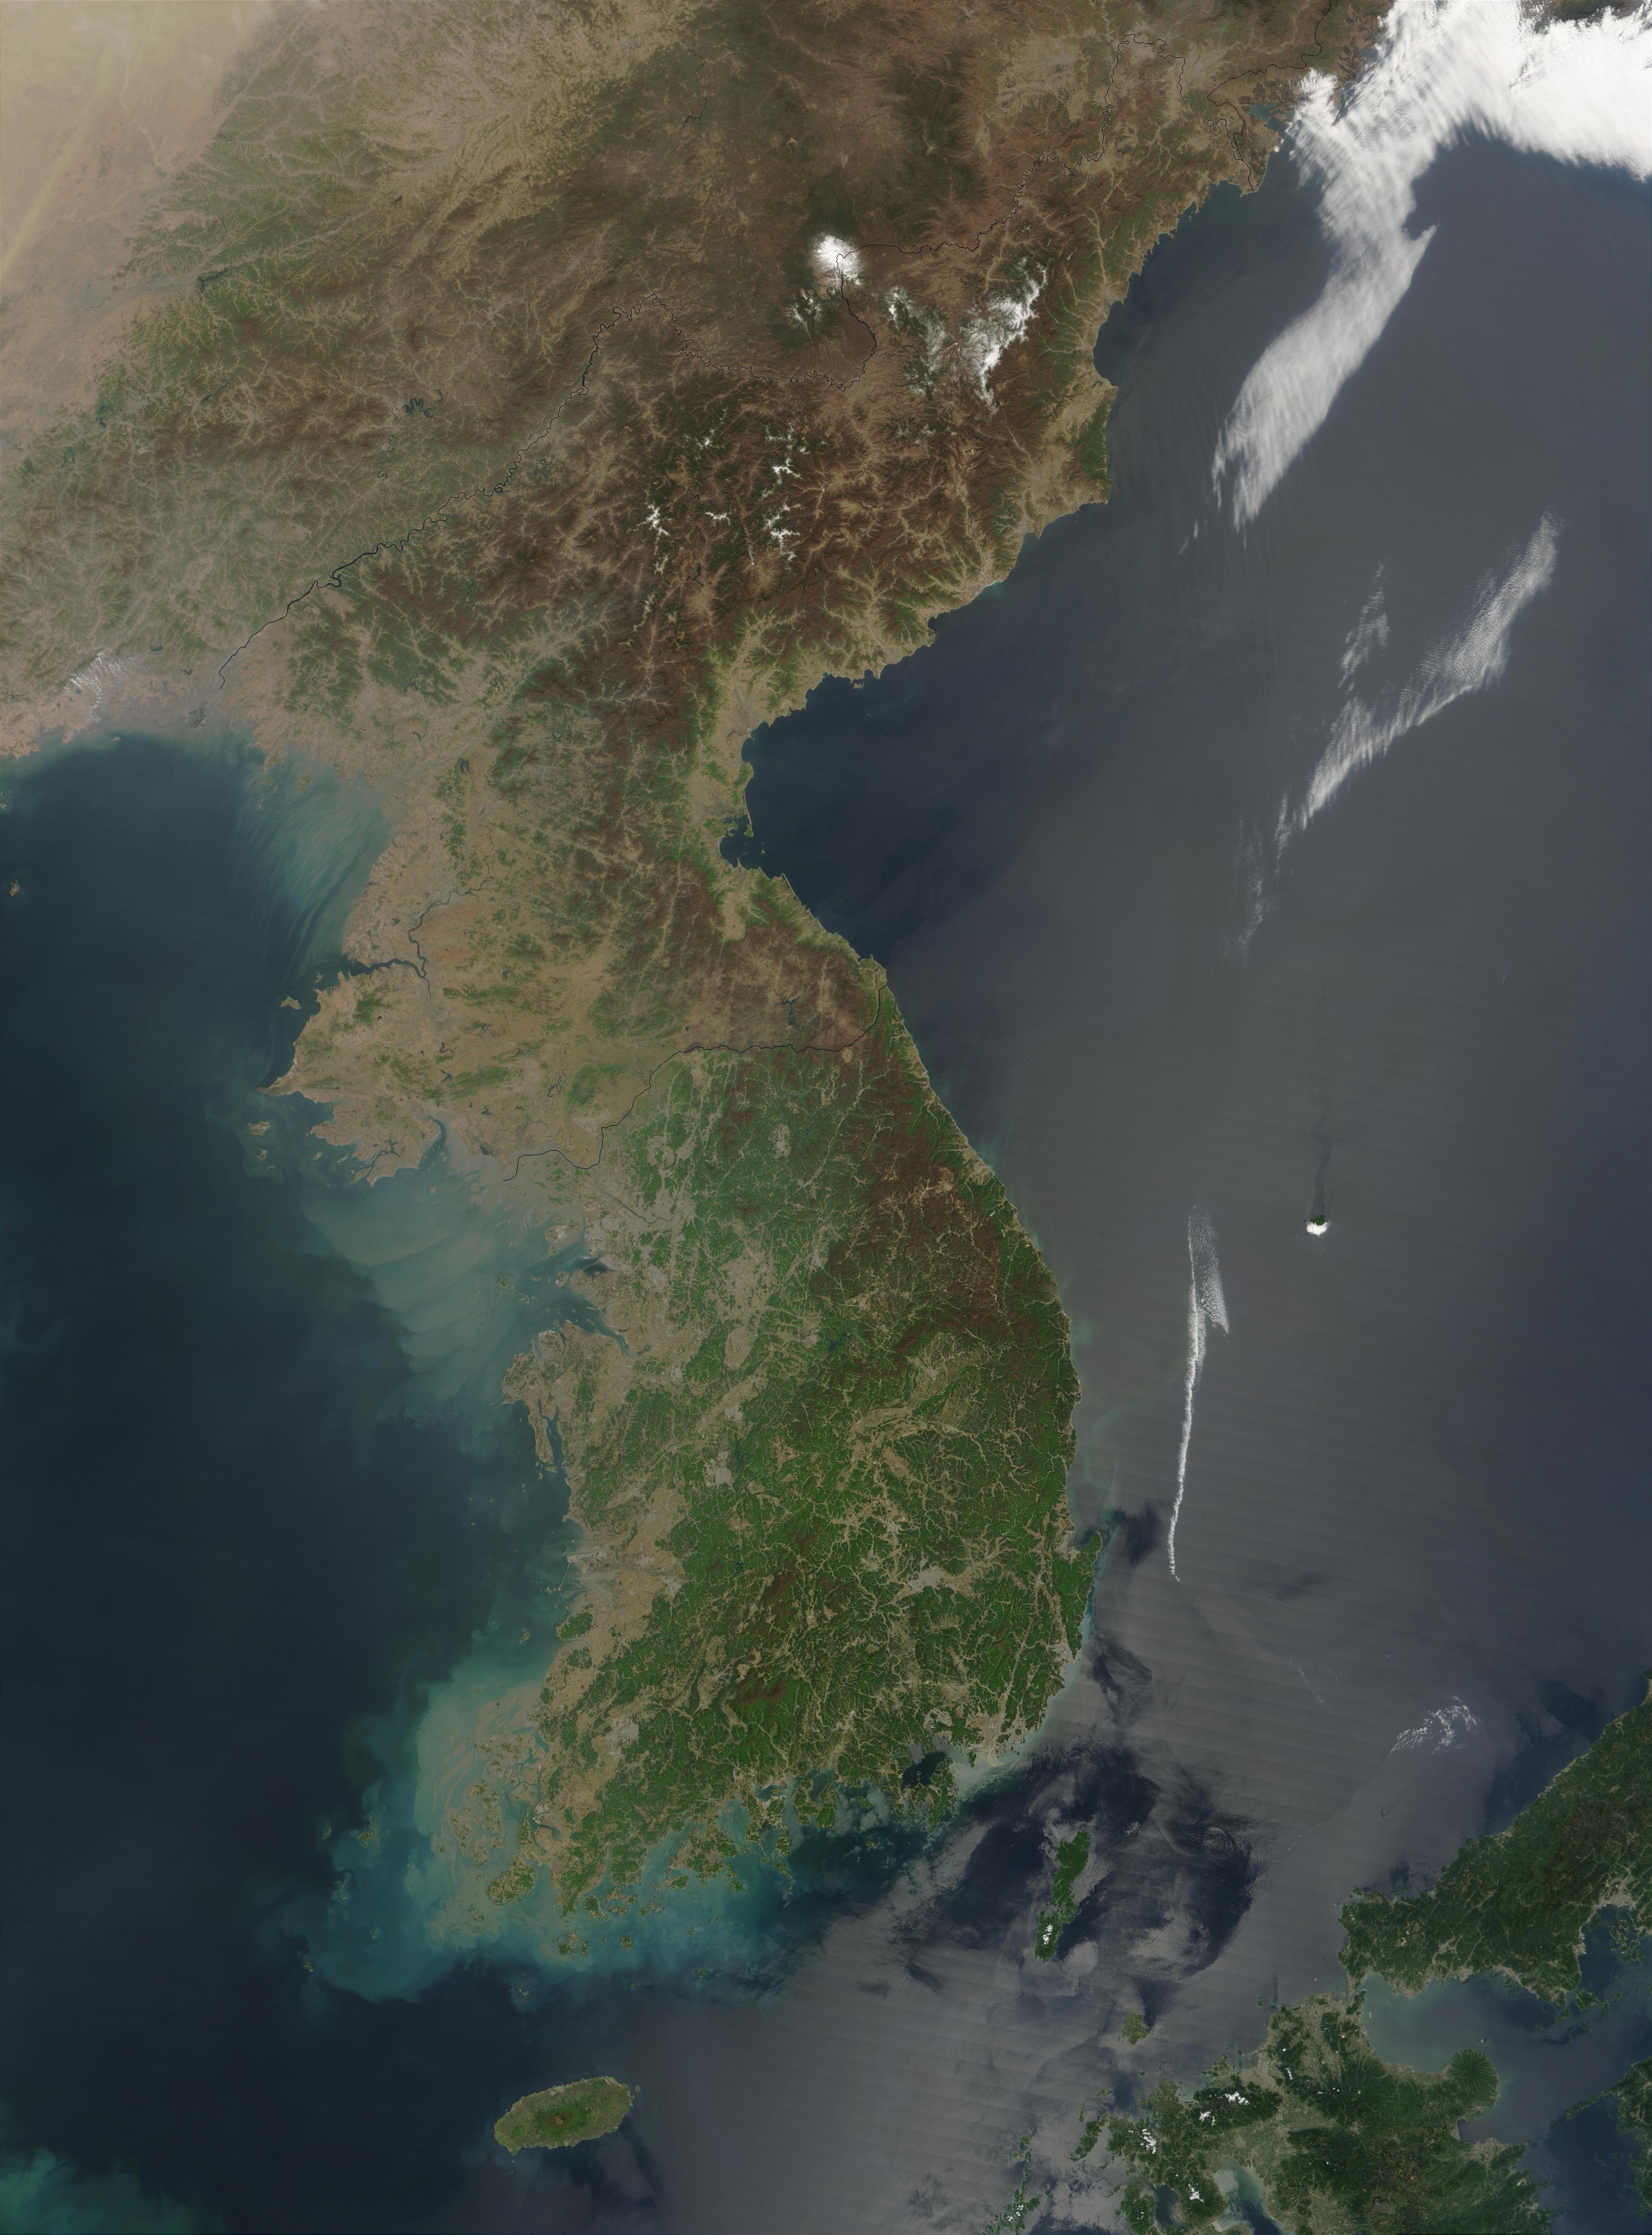 Atlas of North Korea - Wikimedia Commons on map of saudi arabia satellite, map of sri lanka satellite, map of greenland satellite, map of israel satellite, map of korean peninsula satellite, map of singapore satellite, map of pakistan satellite, map of philippines satellite,